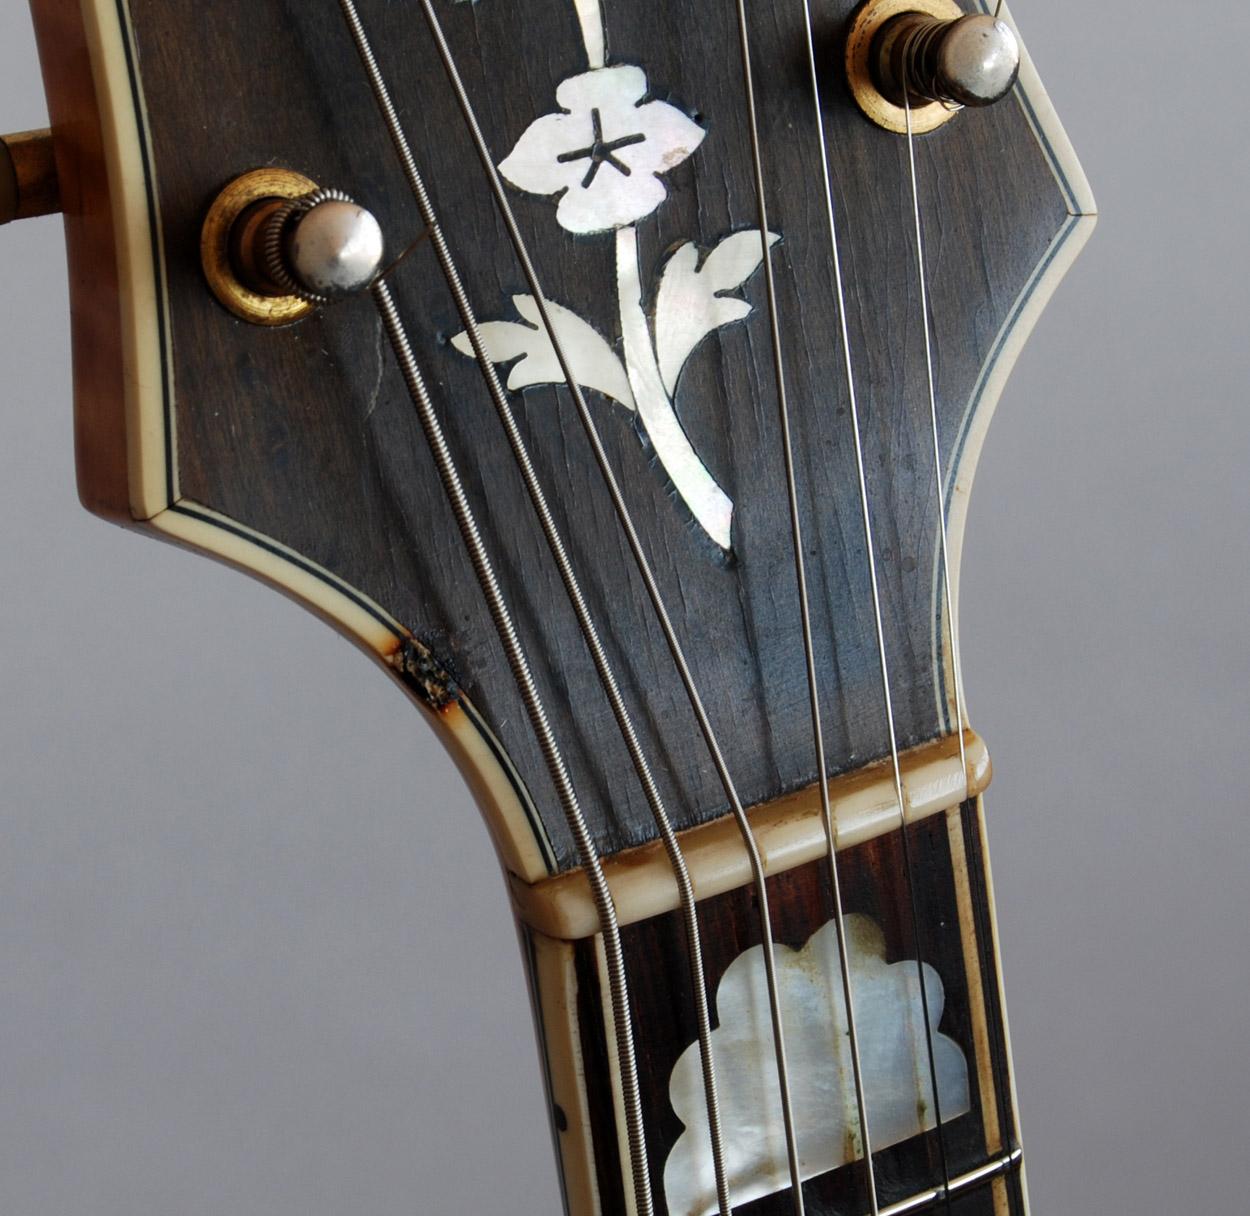 epiphone deluxe guitar for sale. Black Bedroom Furniture Sets. Home Design Ideas